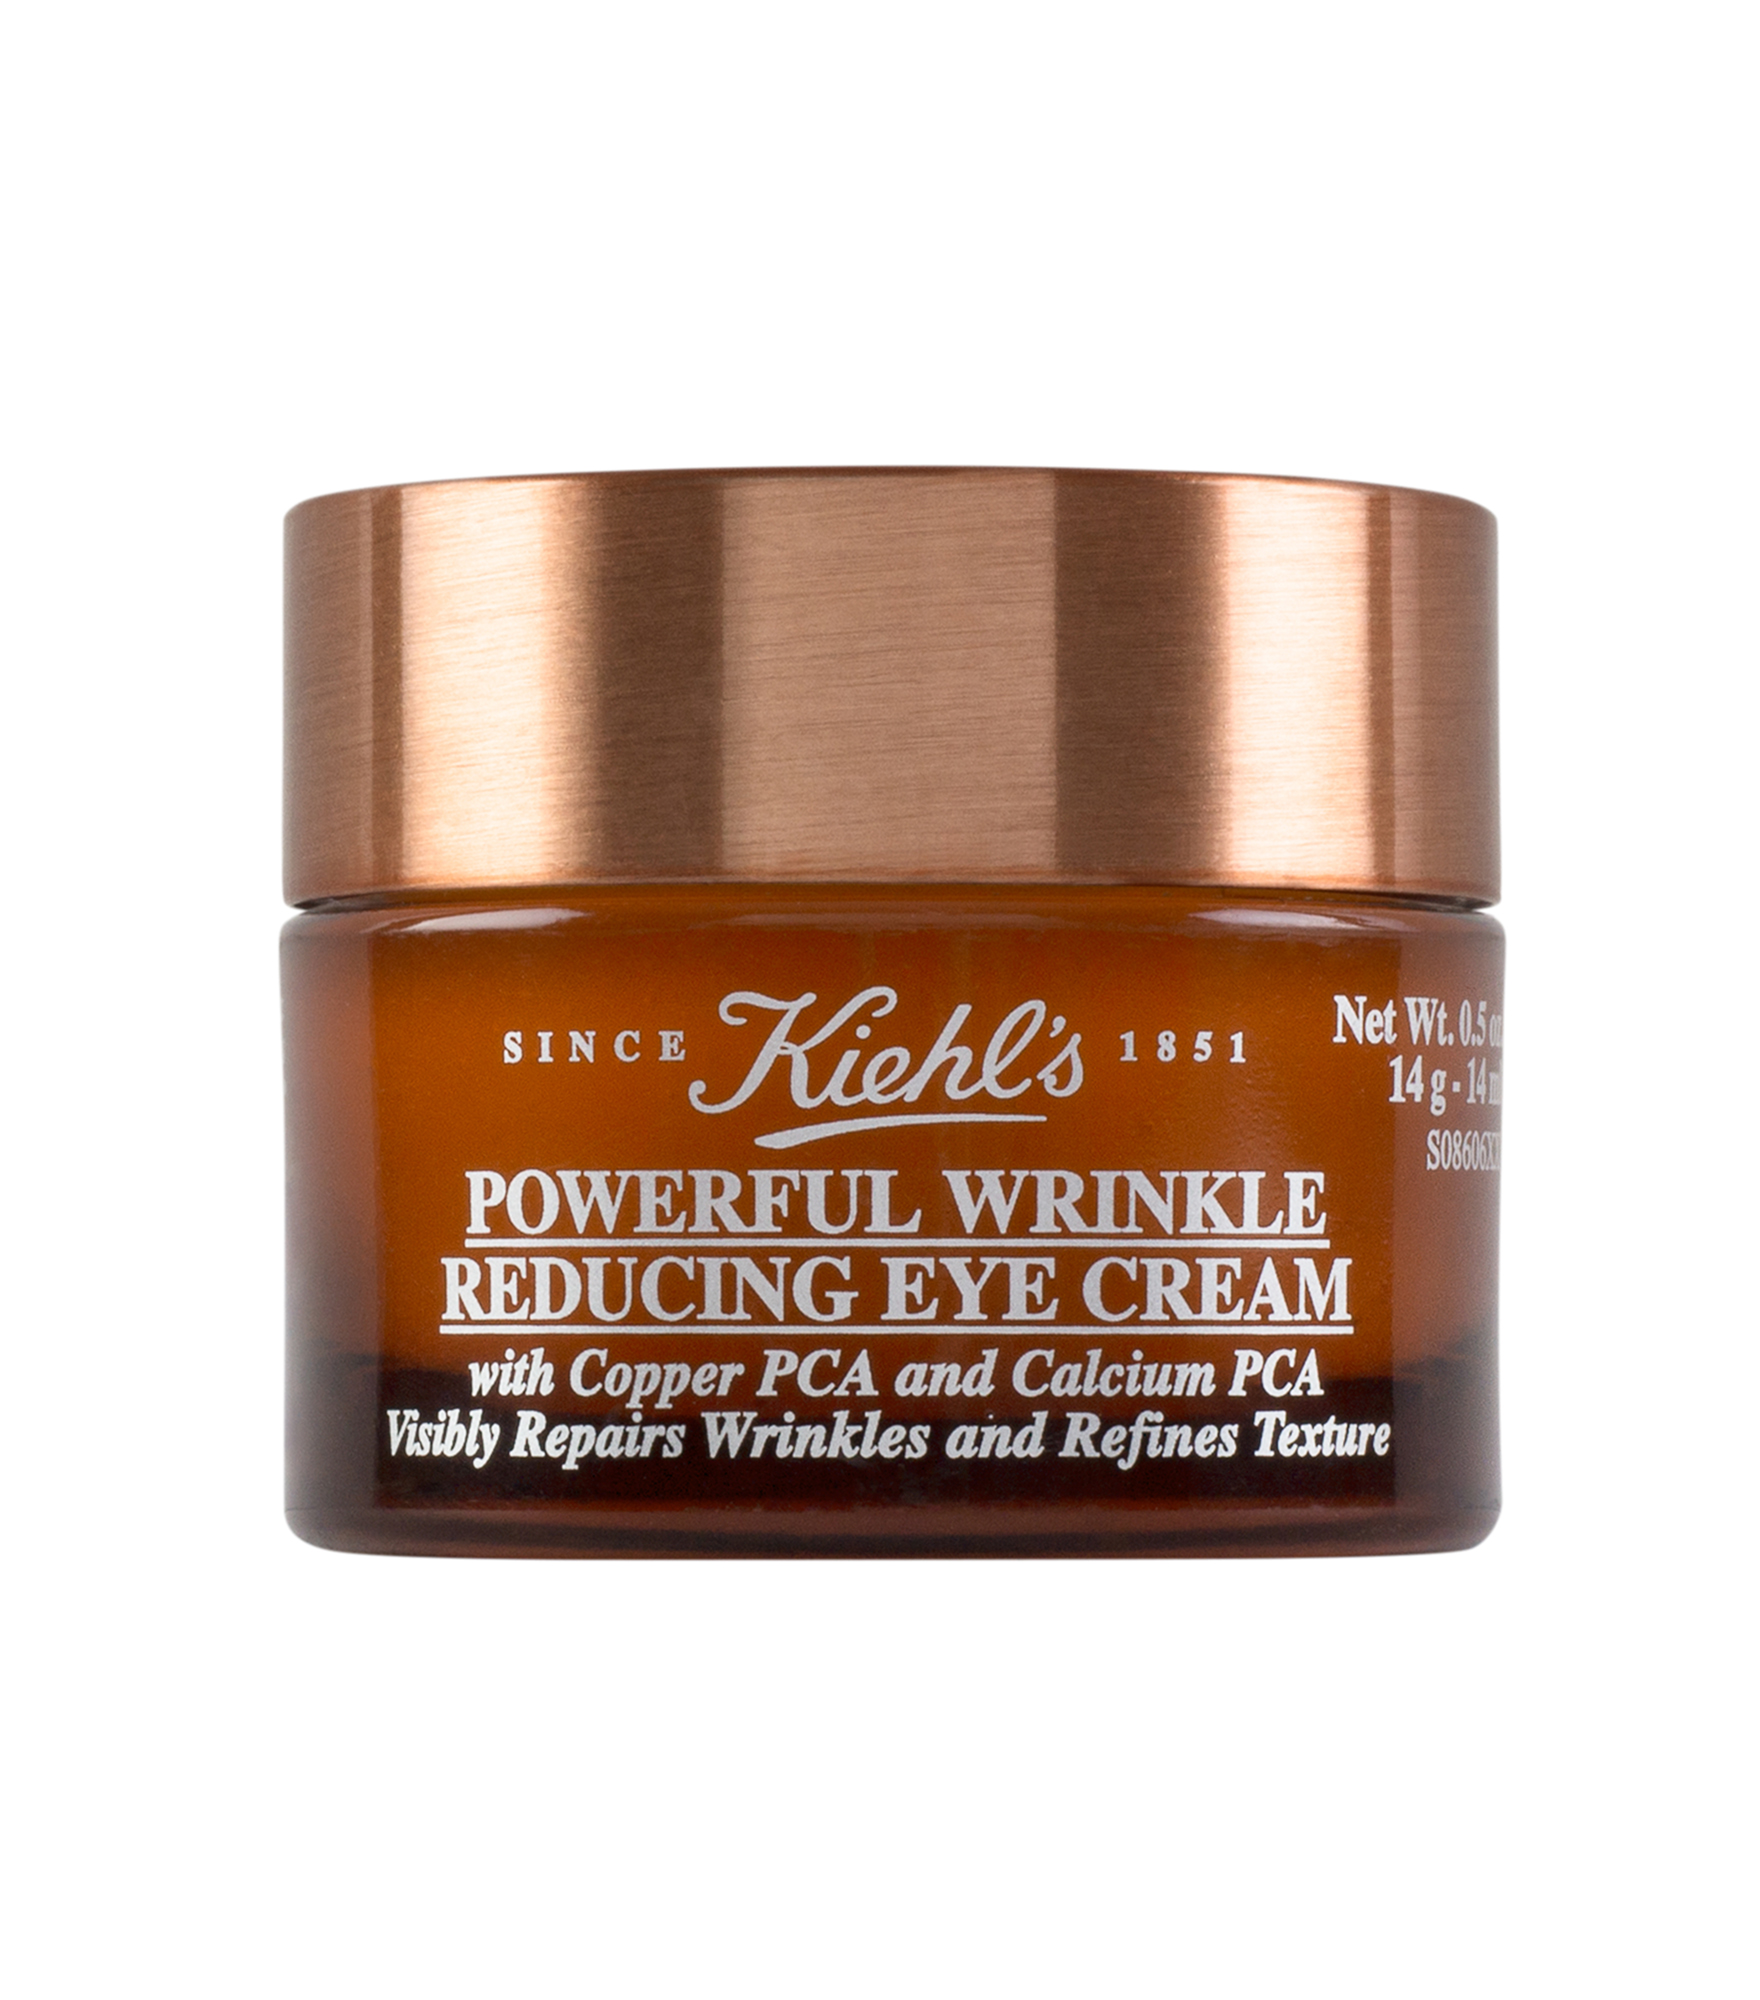 kiehls eye cream review